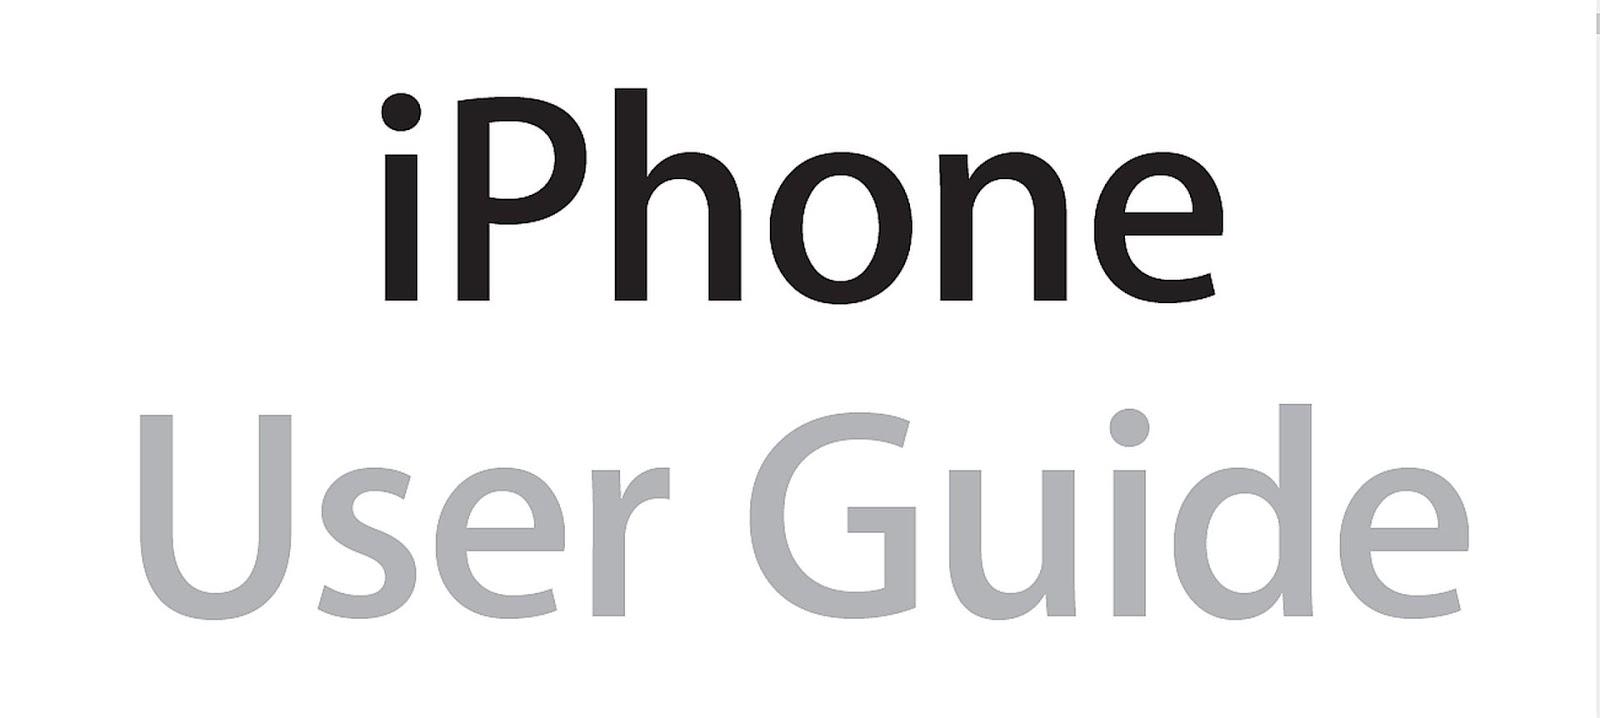 PDFBook2017: iPhone SE Manual PDF